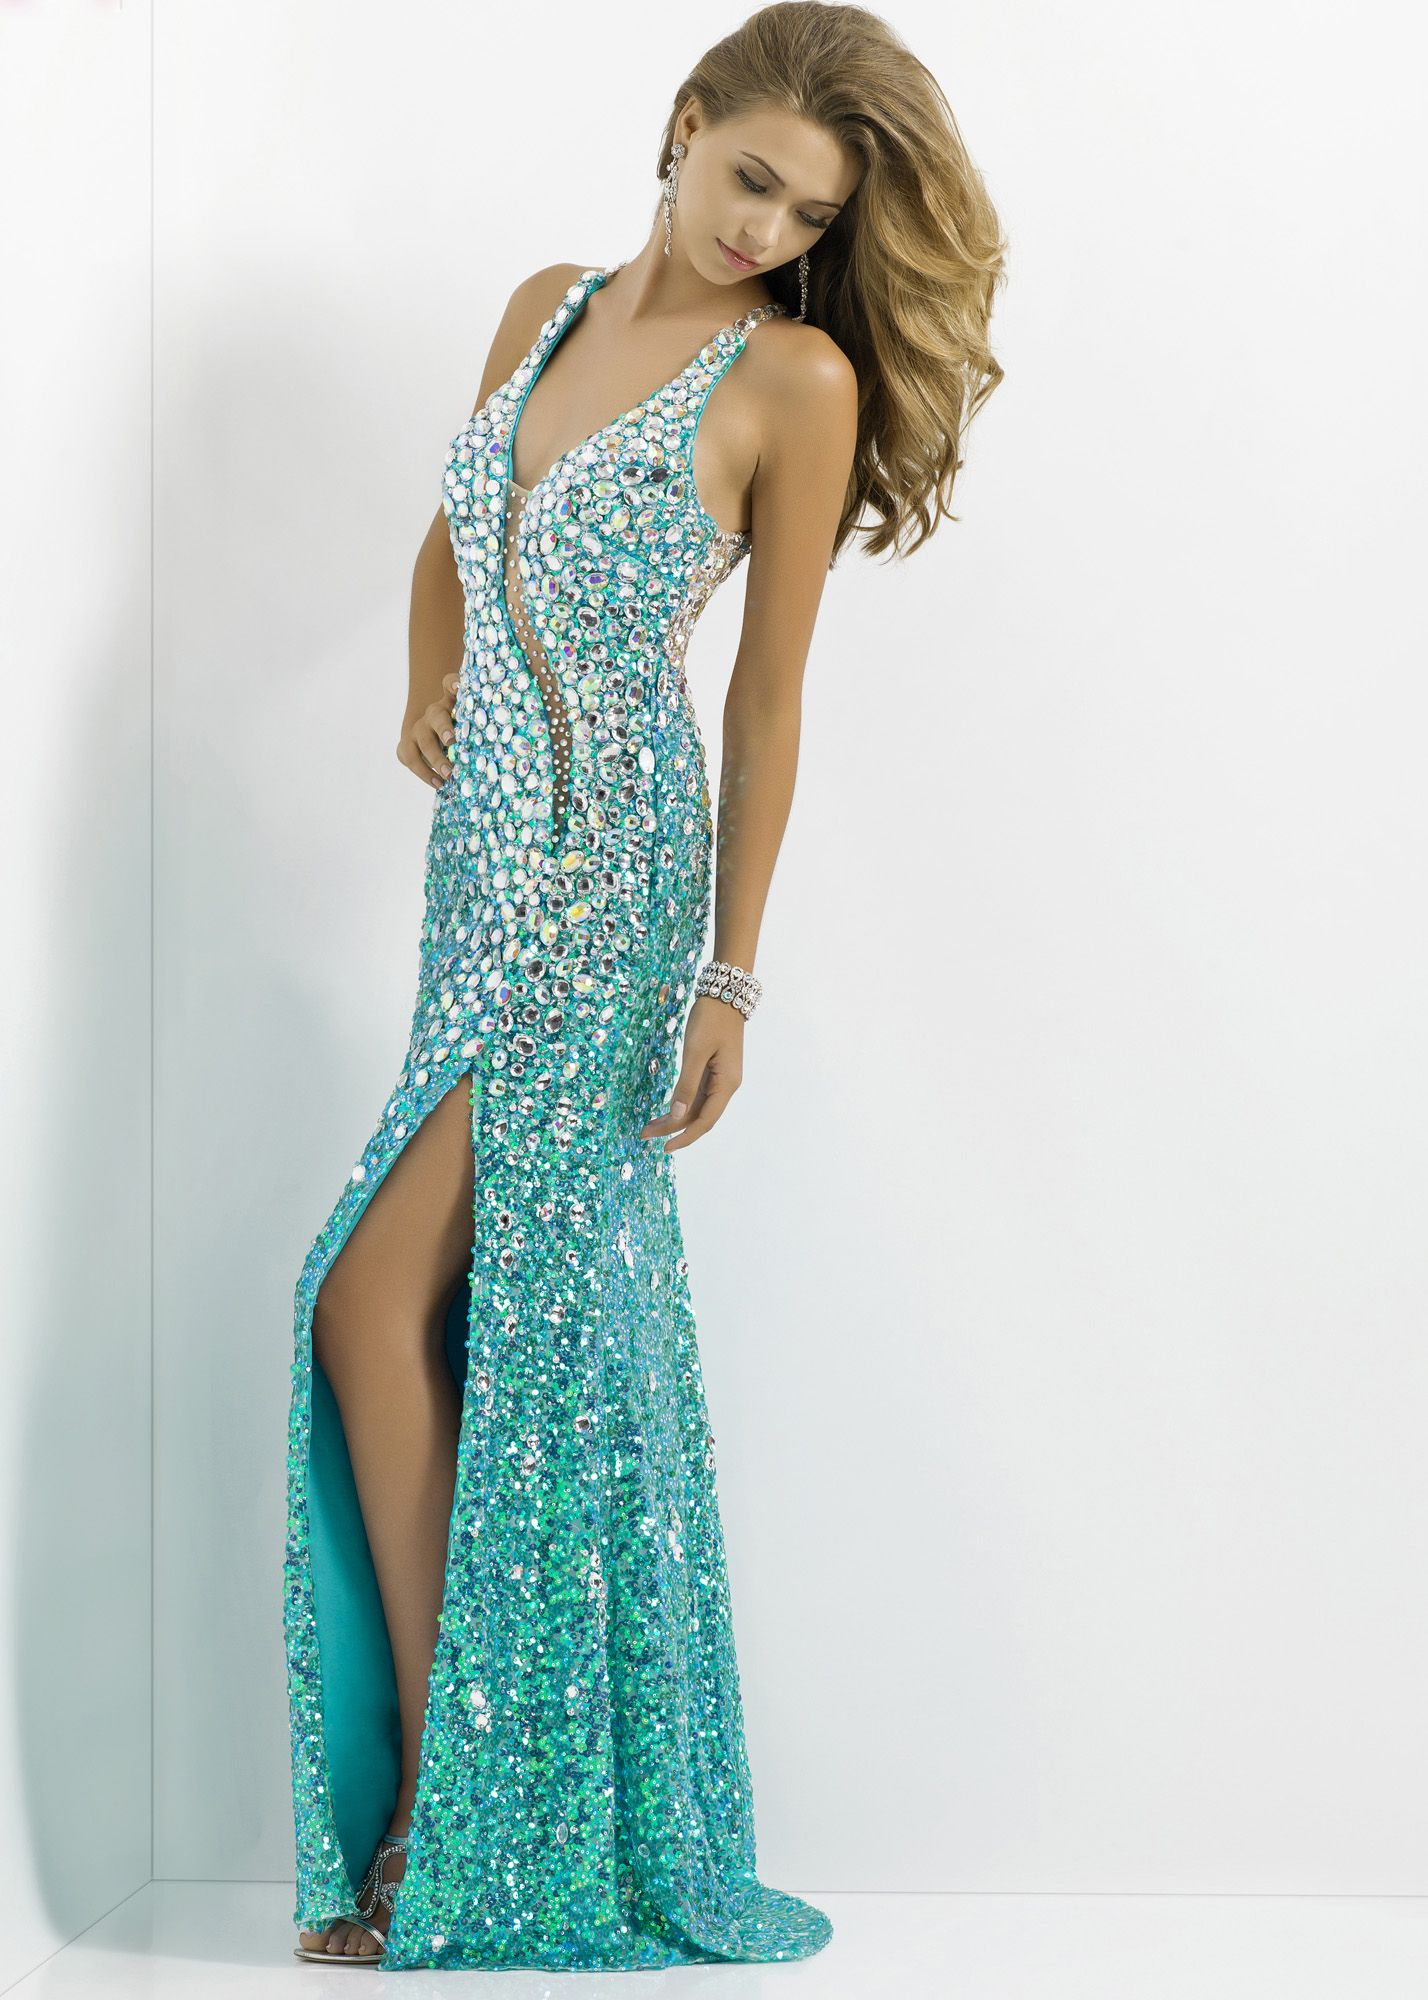 Free Shipping For 2014 Prom Dresses Blush Prom 9701 Green V Neck